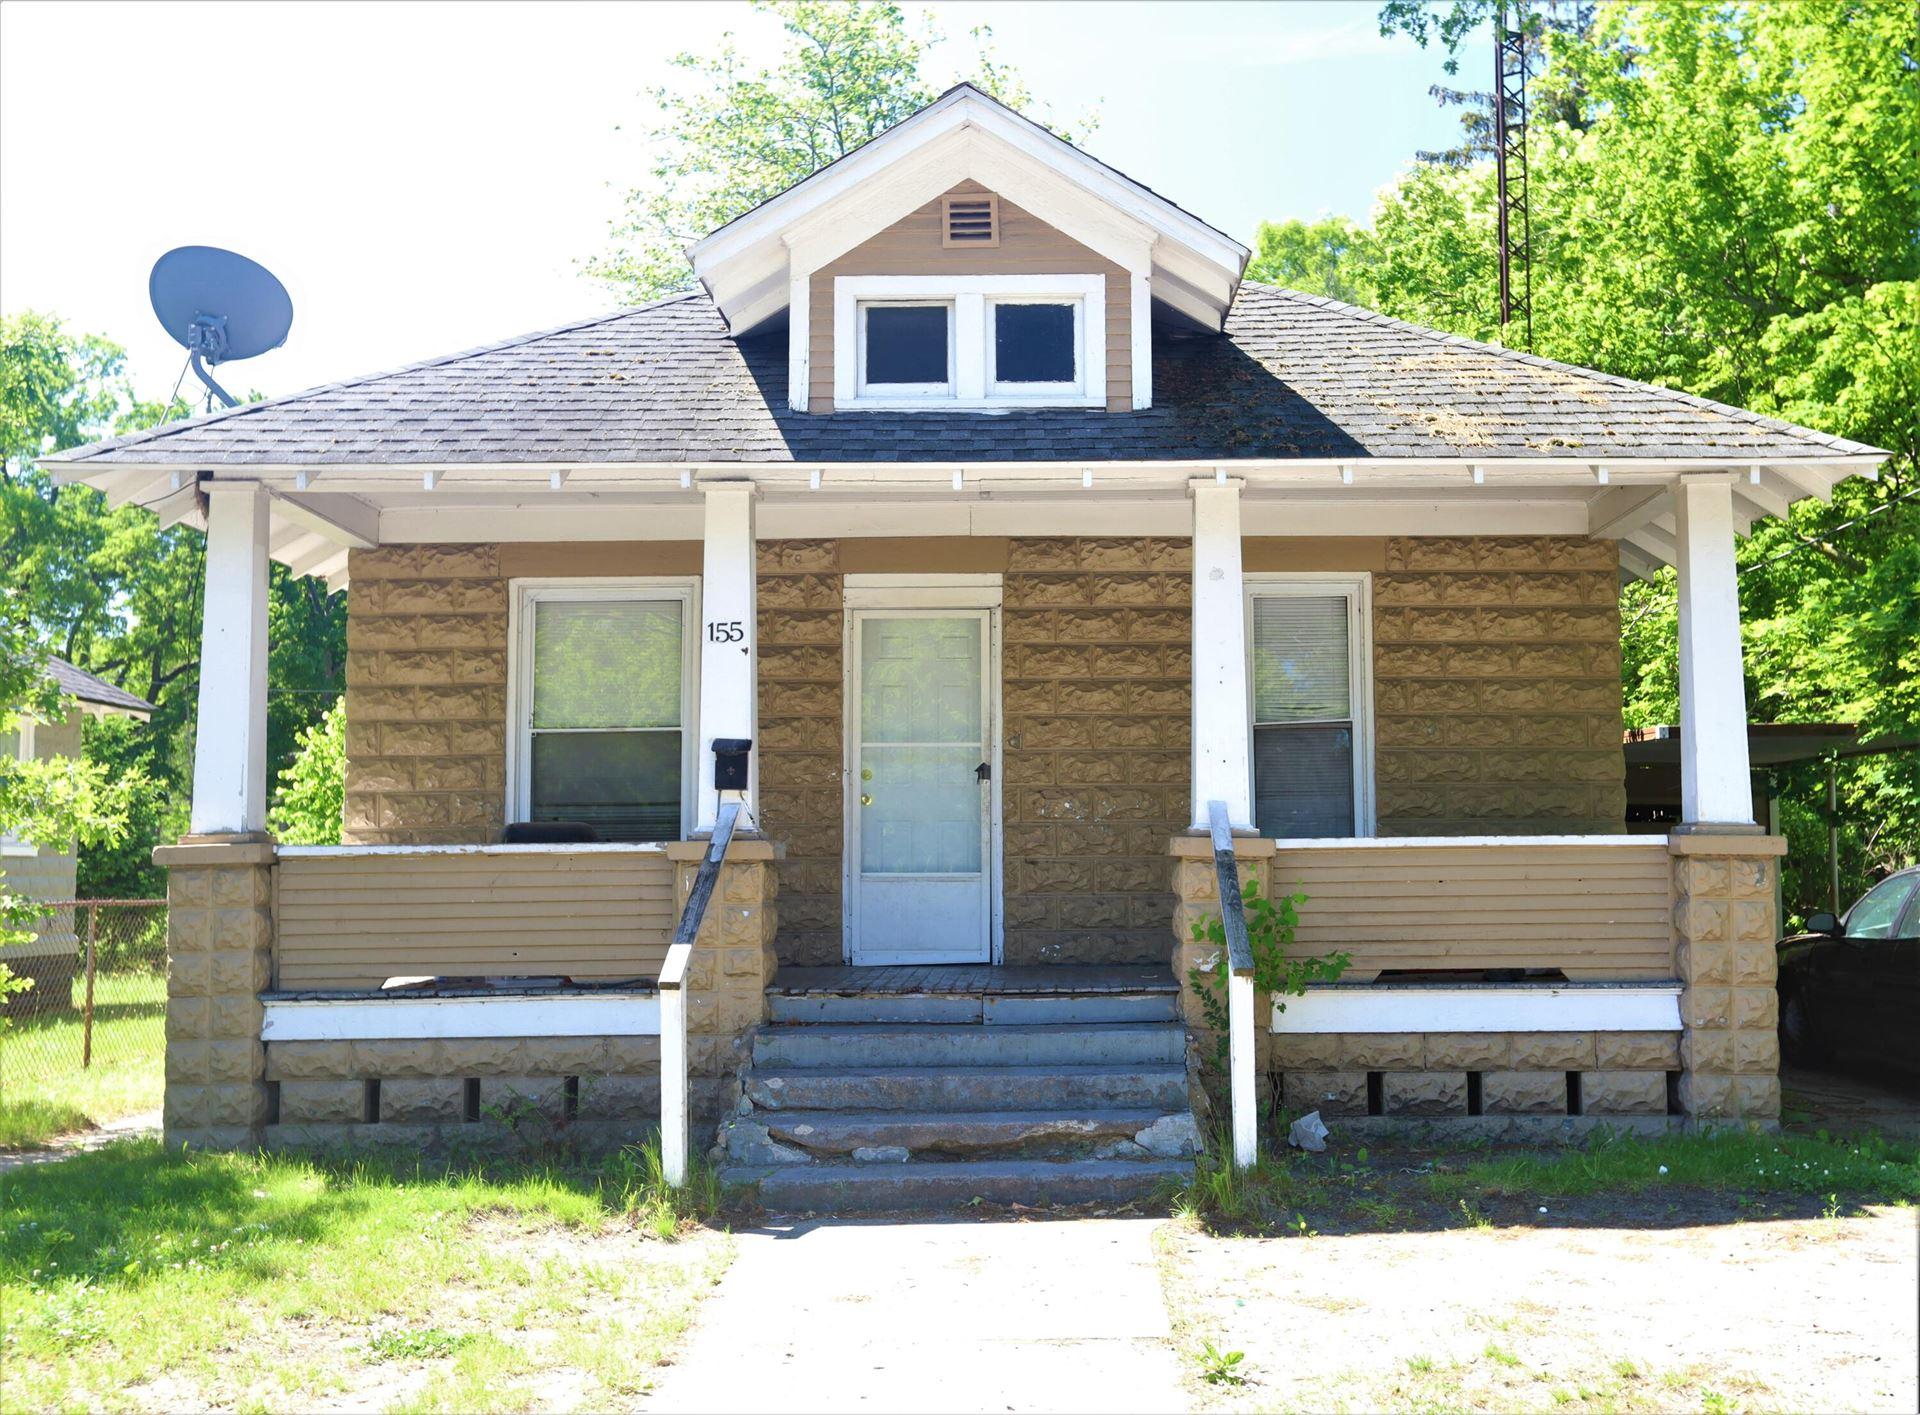 155 W Summit Avenue, Muskegon Heights, MI 49444 - MLS#: 21023038